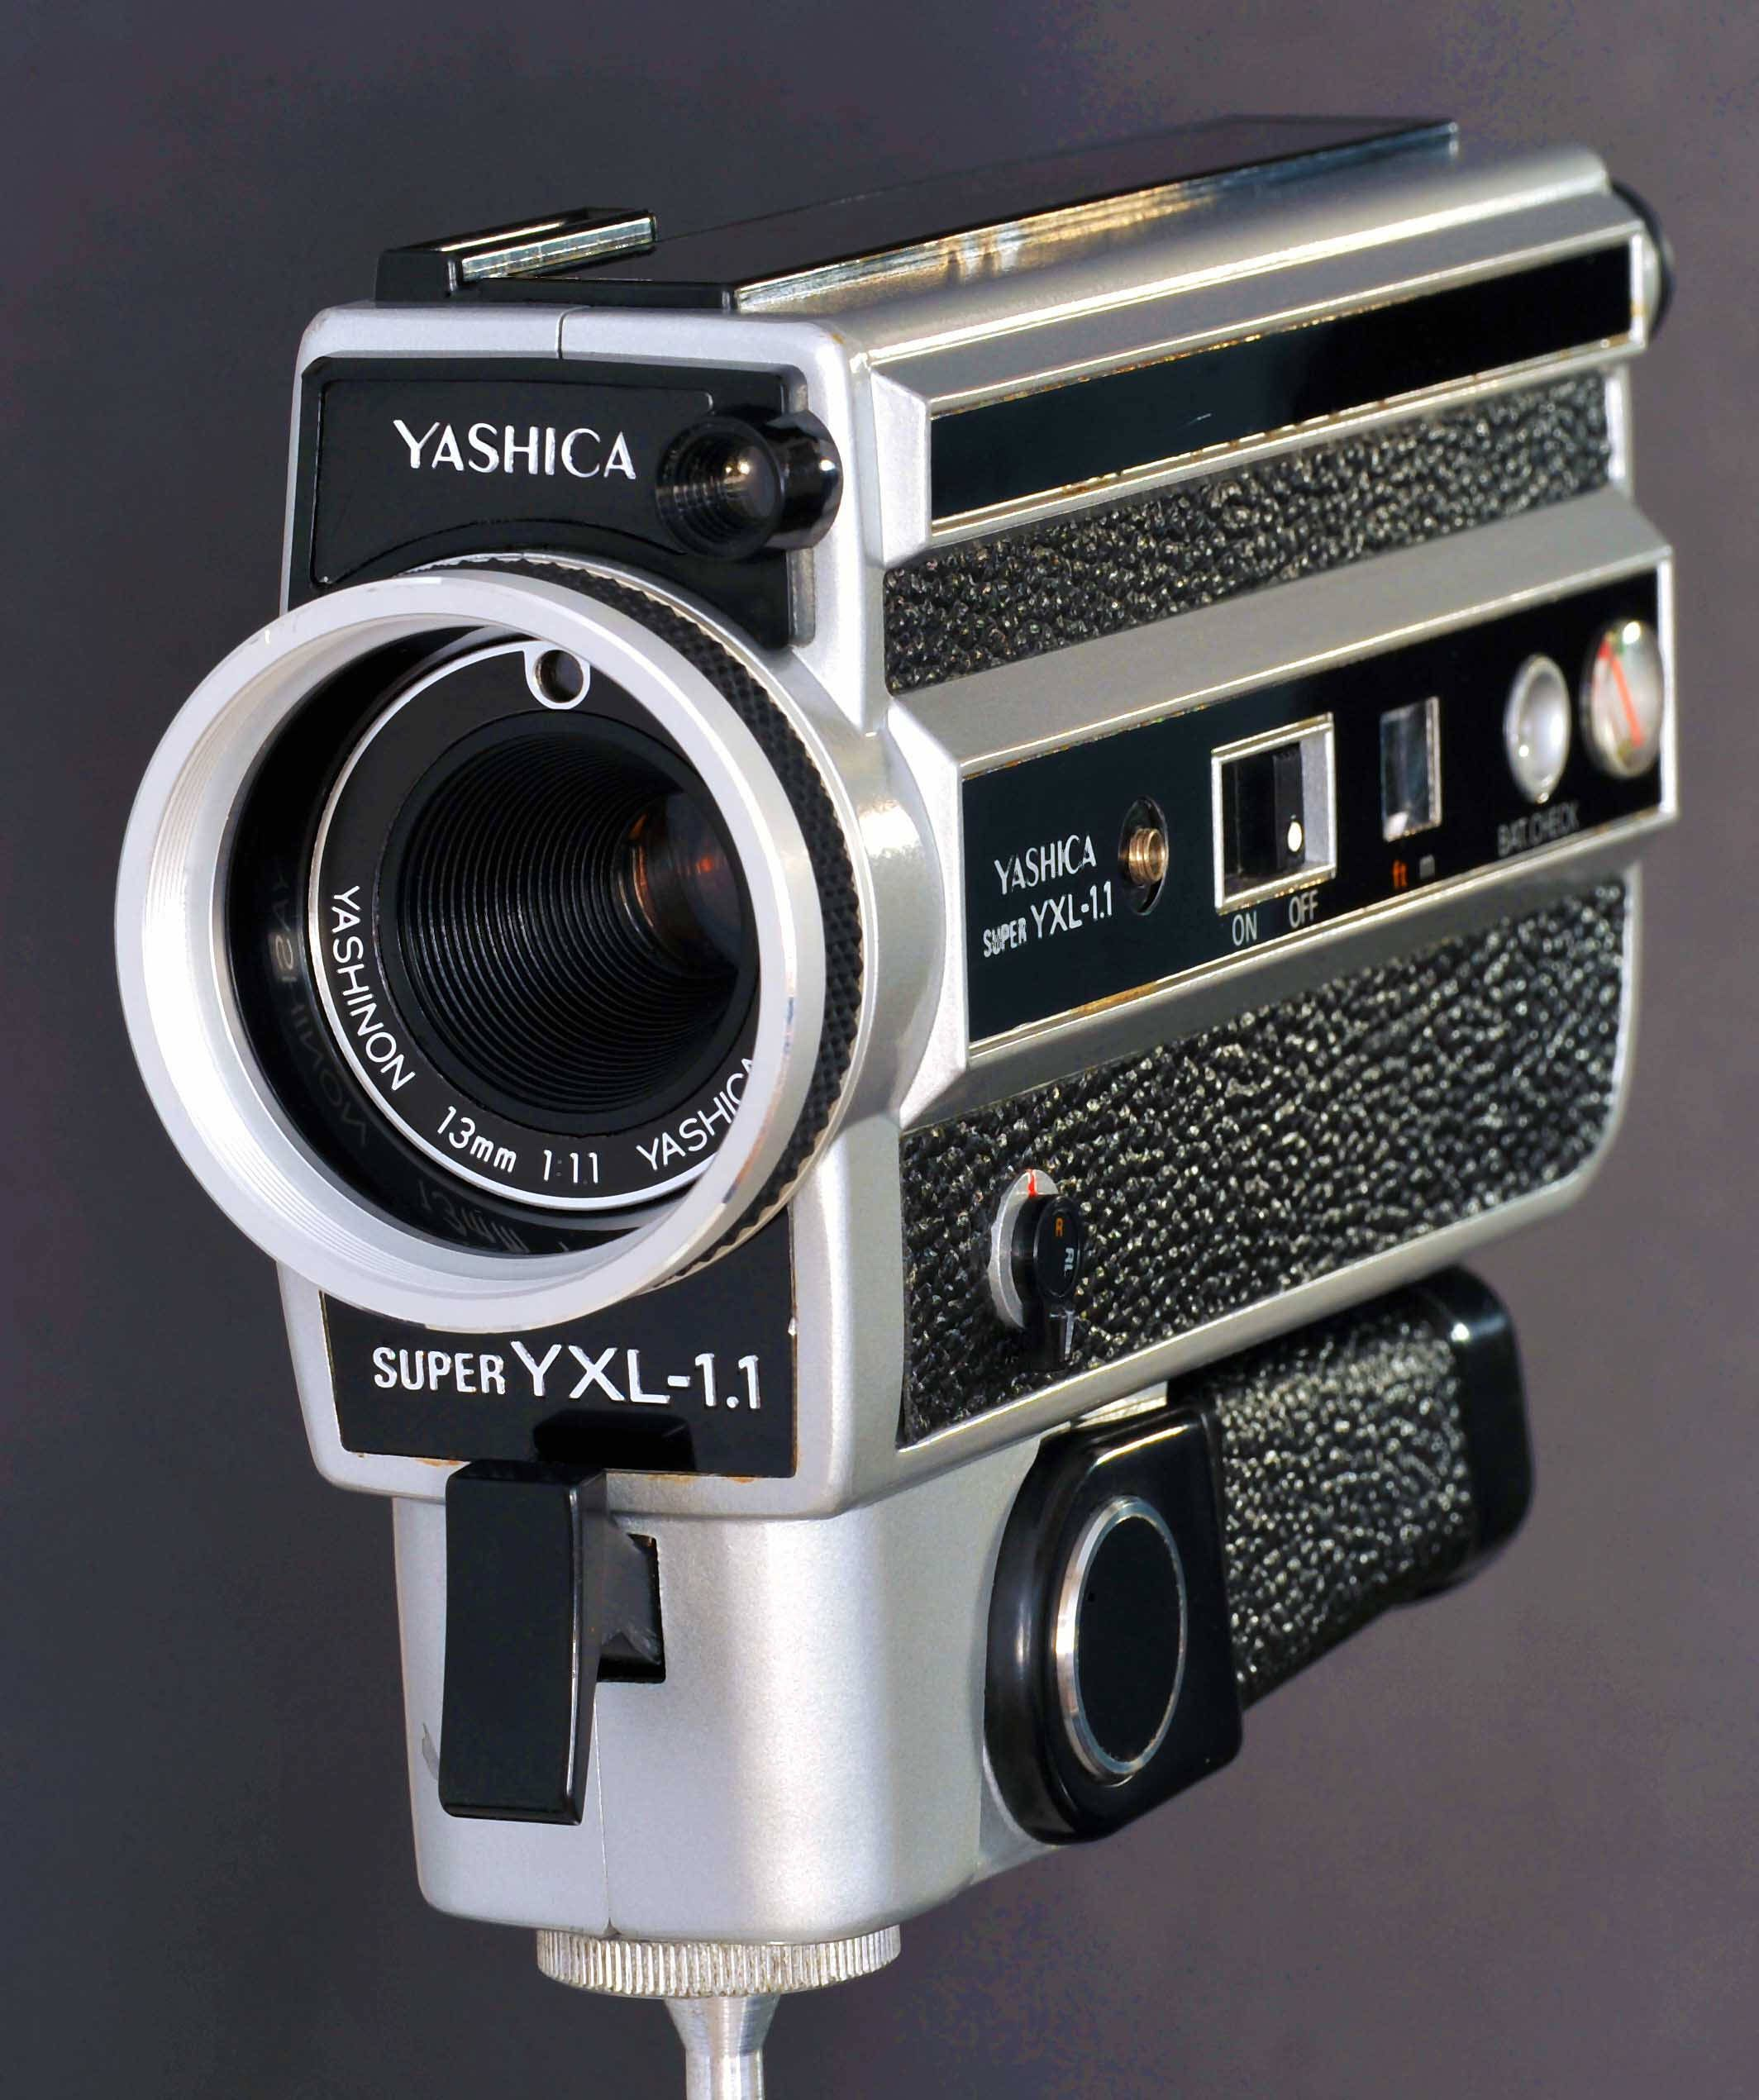 Yashica Super 8 YXL-1 1 S8 Movie Camera w 13mm f/1 1 Prime